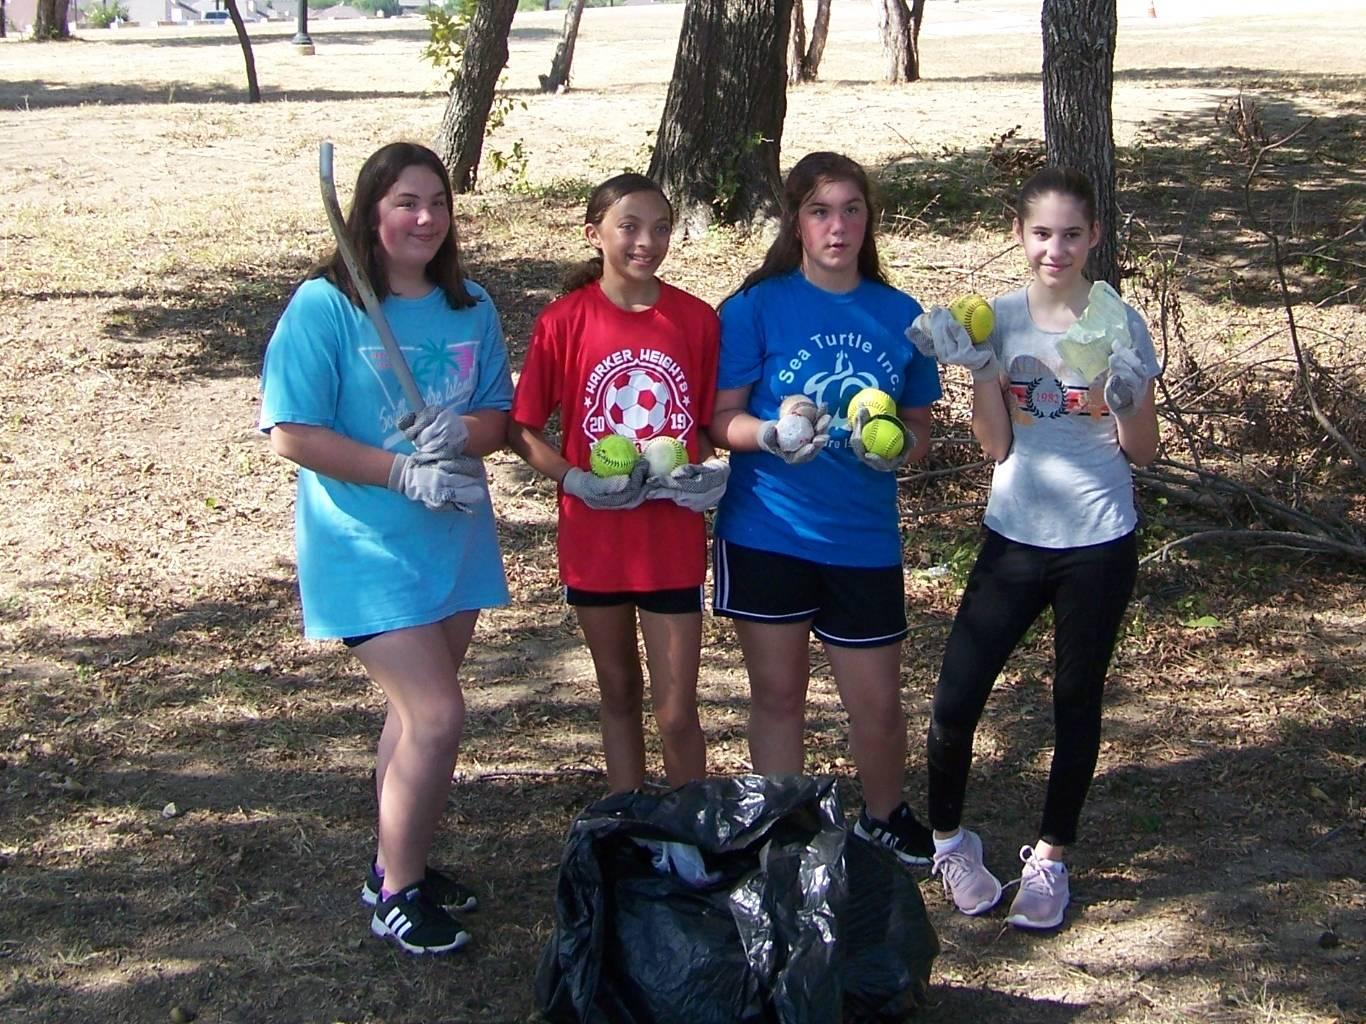 Lots of baseballs and softballs were found